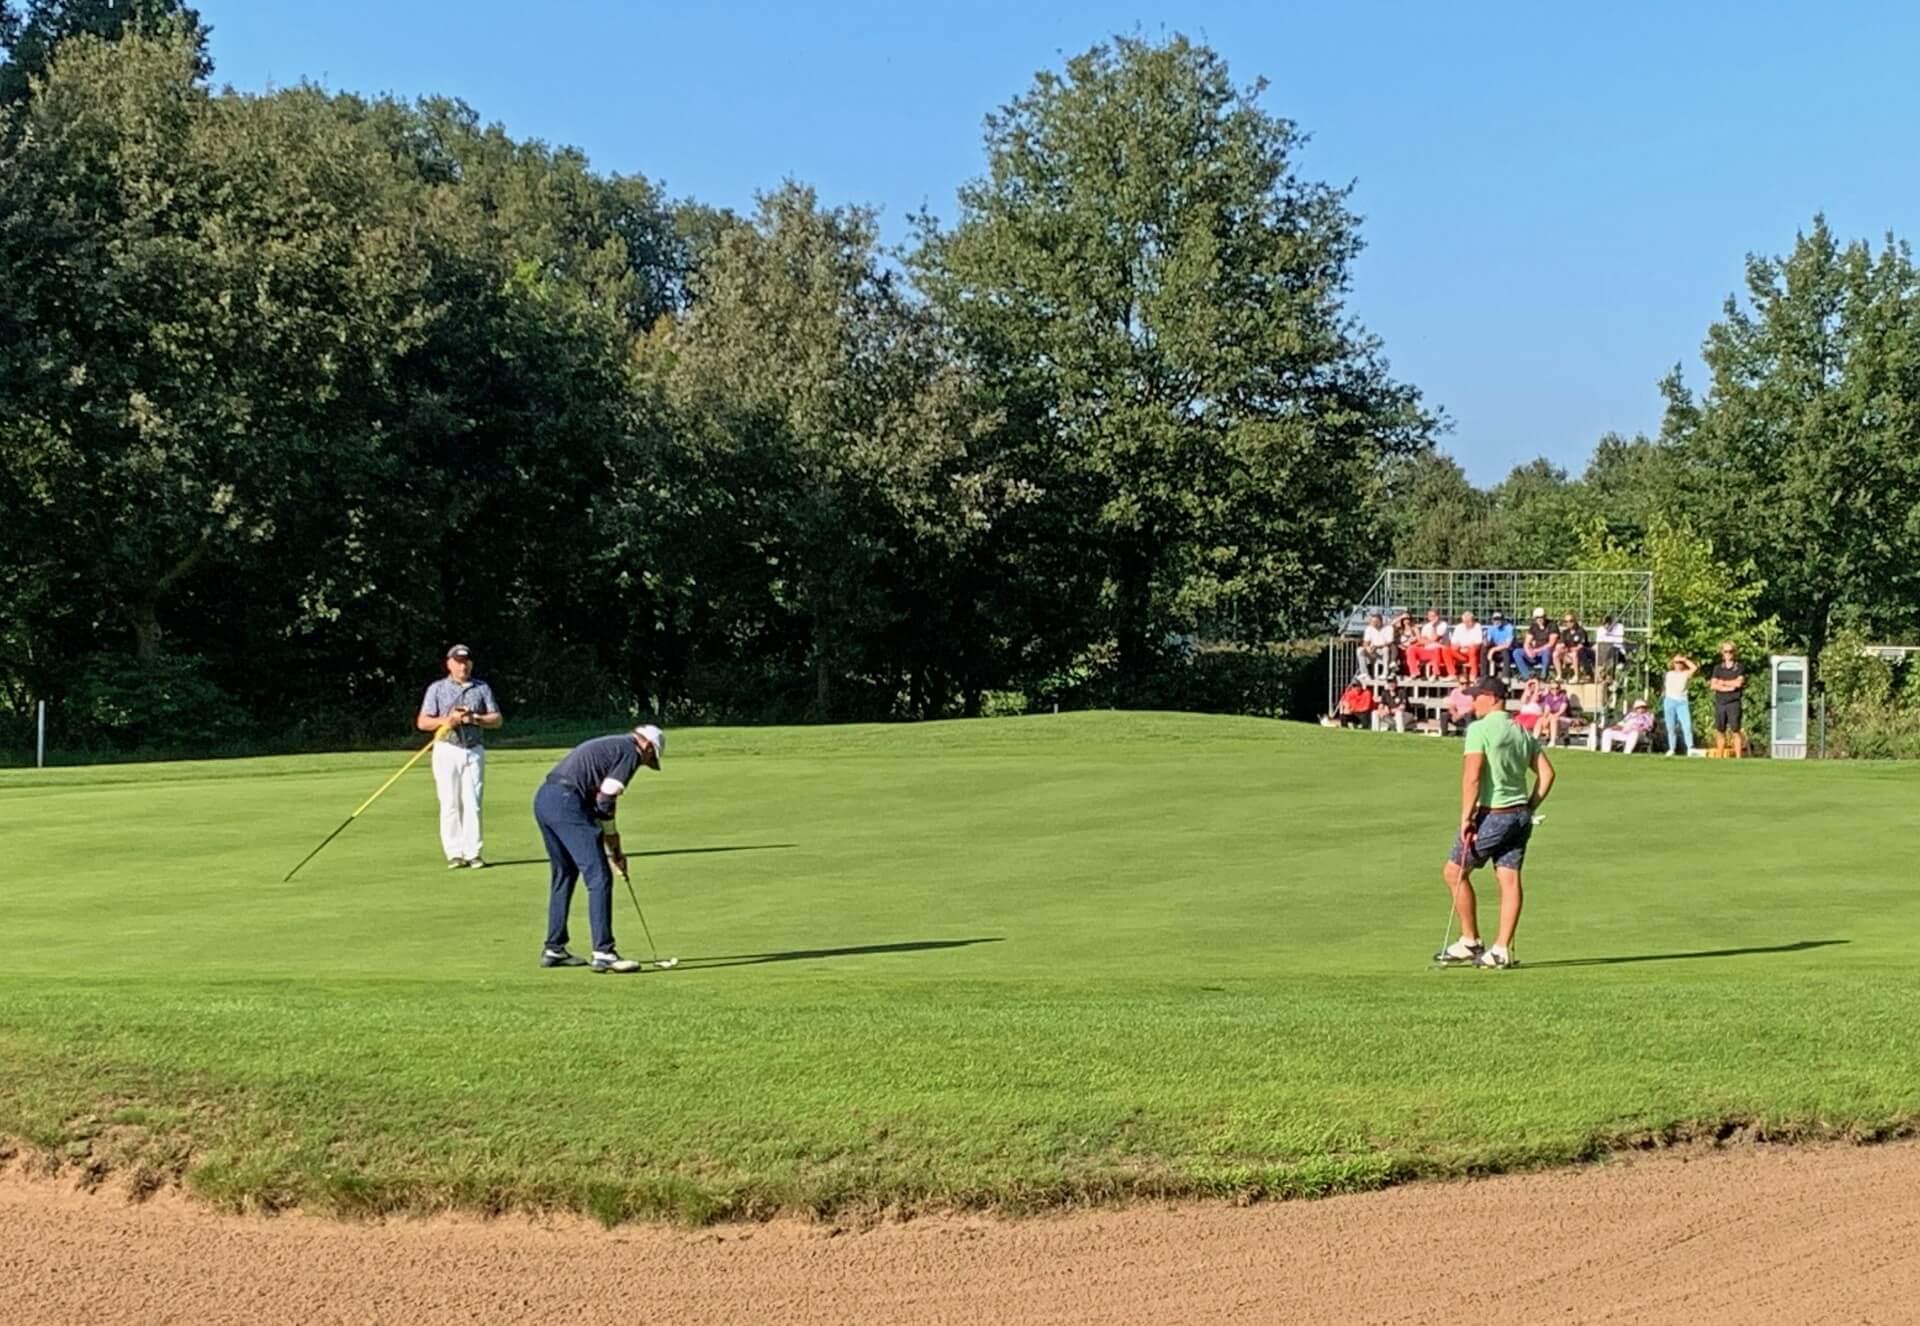 https://golfclub-peckeloh.de/wp-content/uploads/2021/09/2021_Meister_Putt_vorm_Publikum.jpg